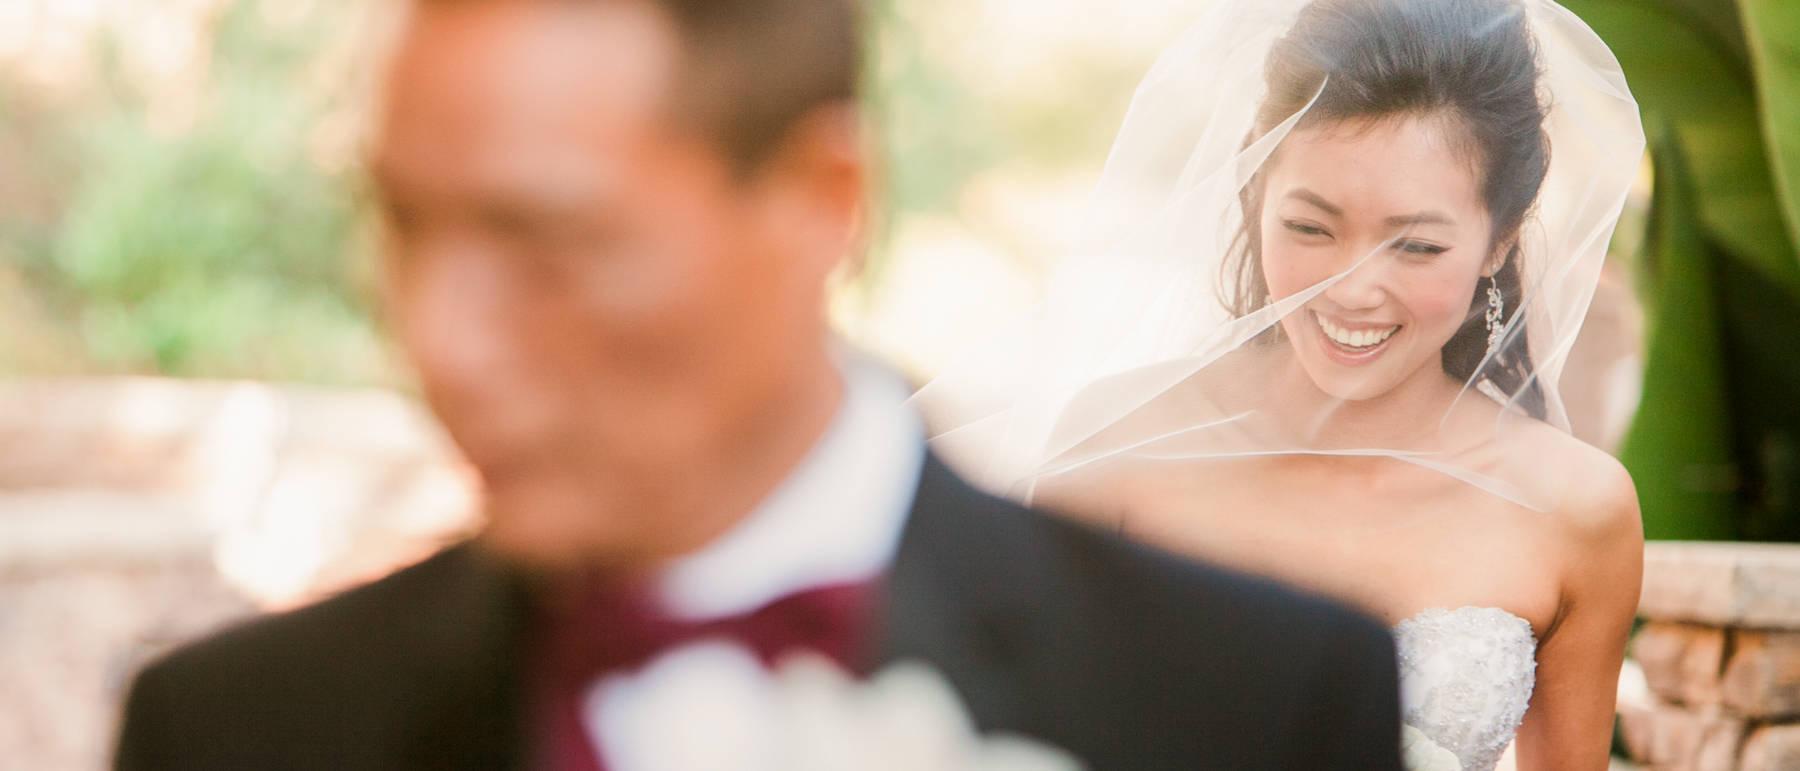 johnandjoseph-wedding-photographer-hz-slider-346